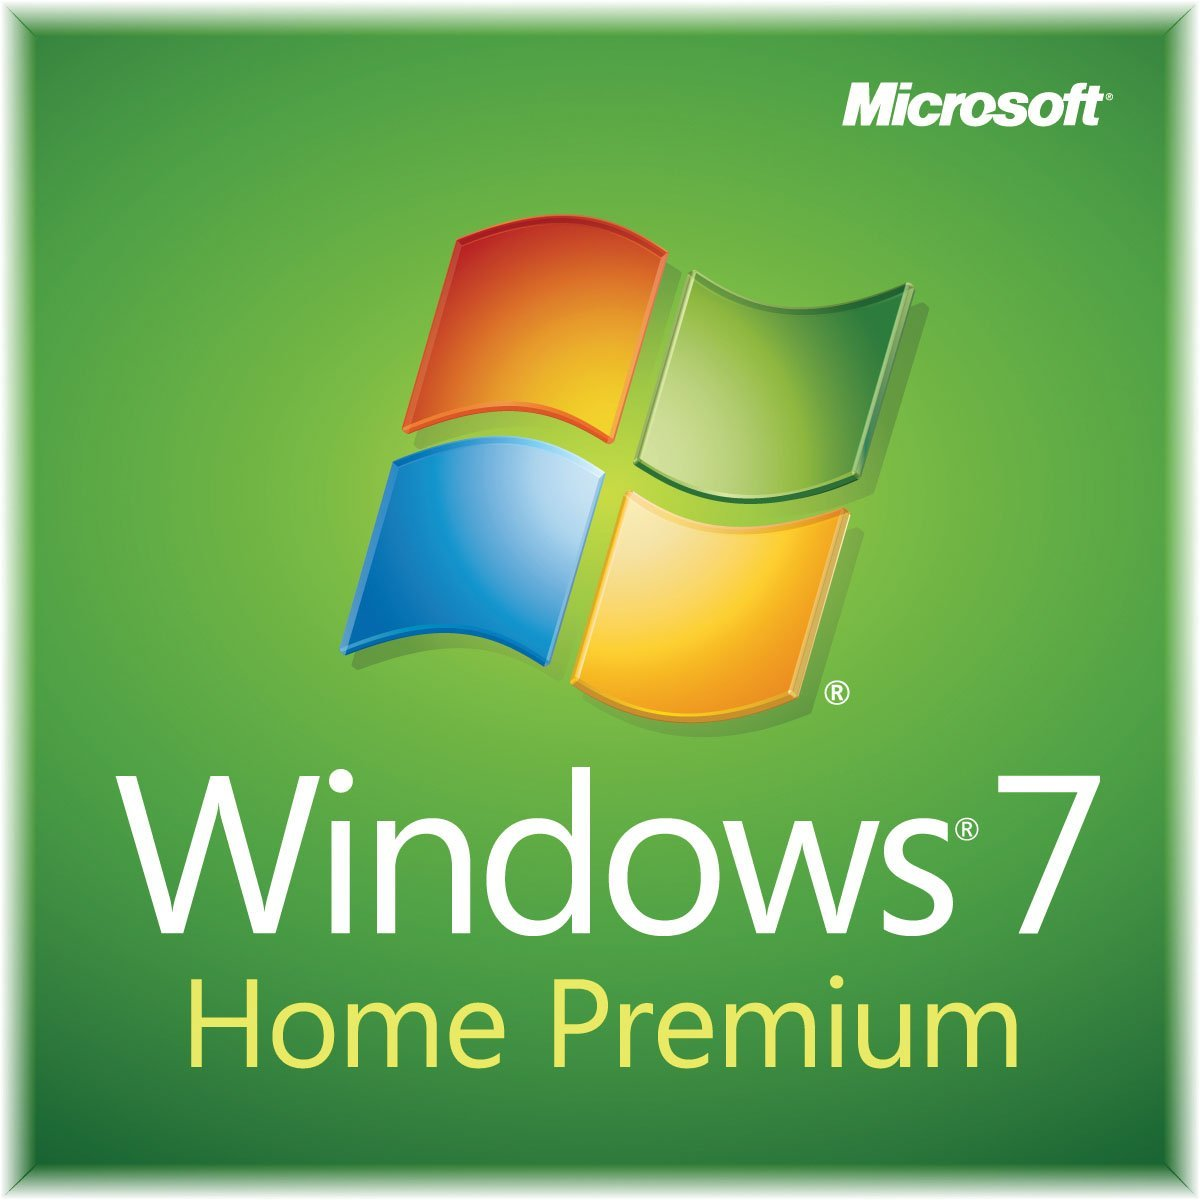 Windows 7 Home Premium With Service Pack 1 64-bit